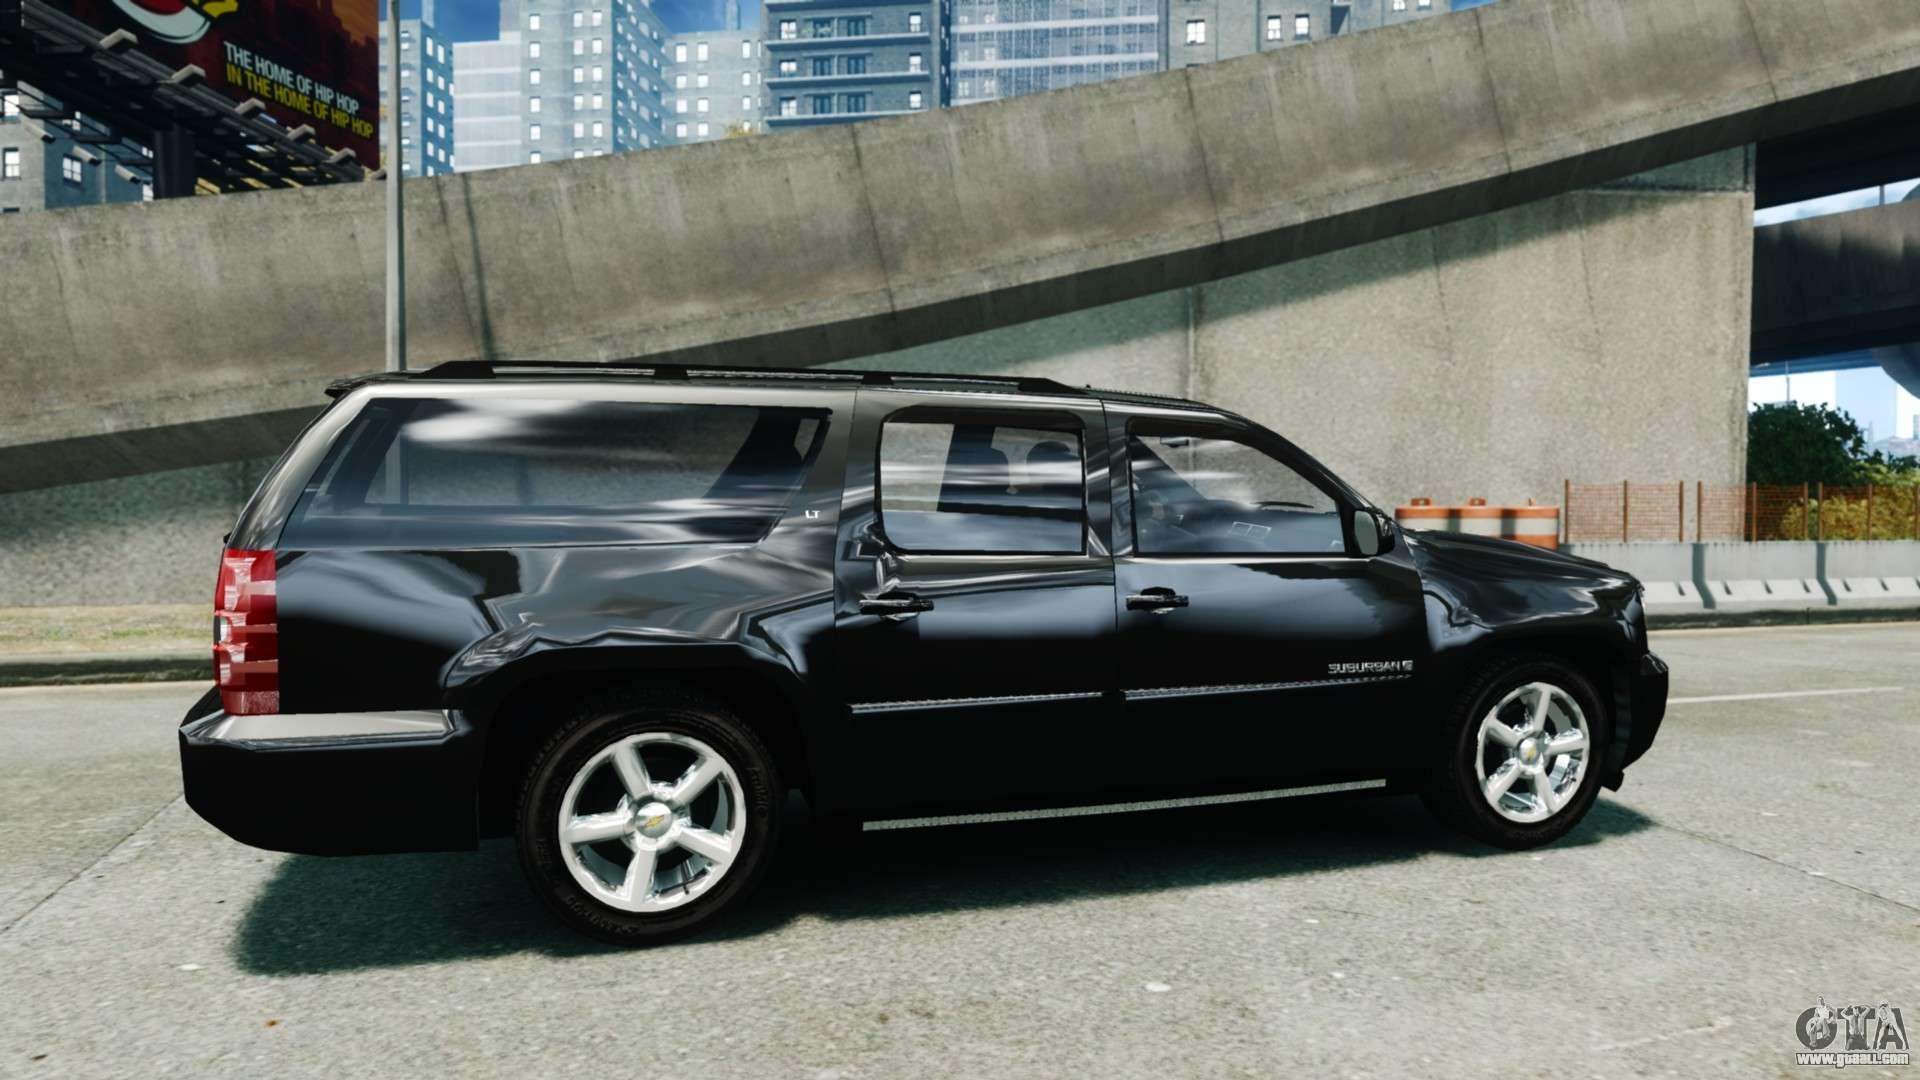 Chevrolet Suburban 2008 FBI [ELS] for GTA 4